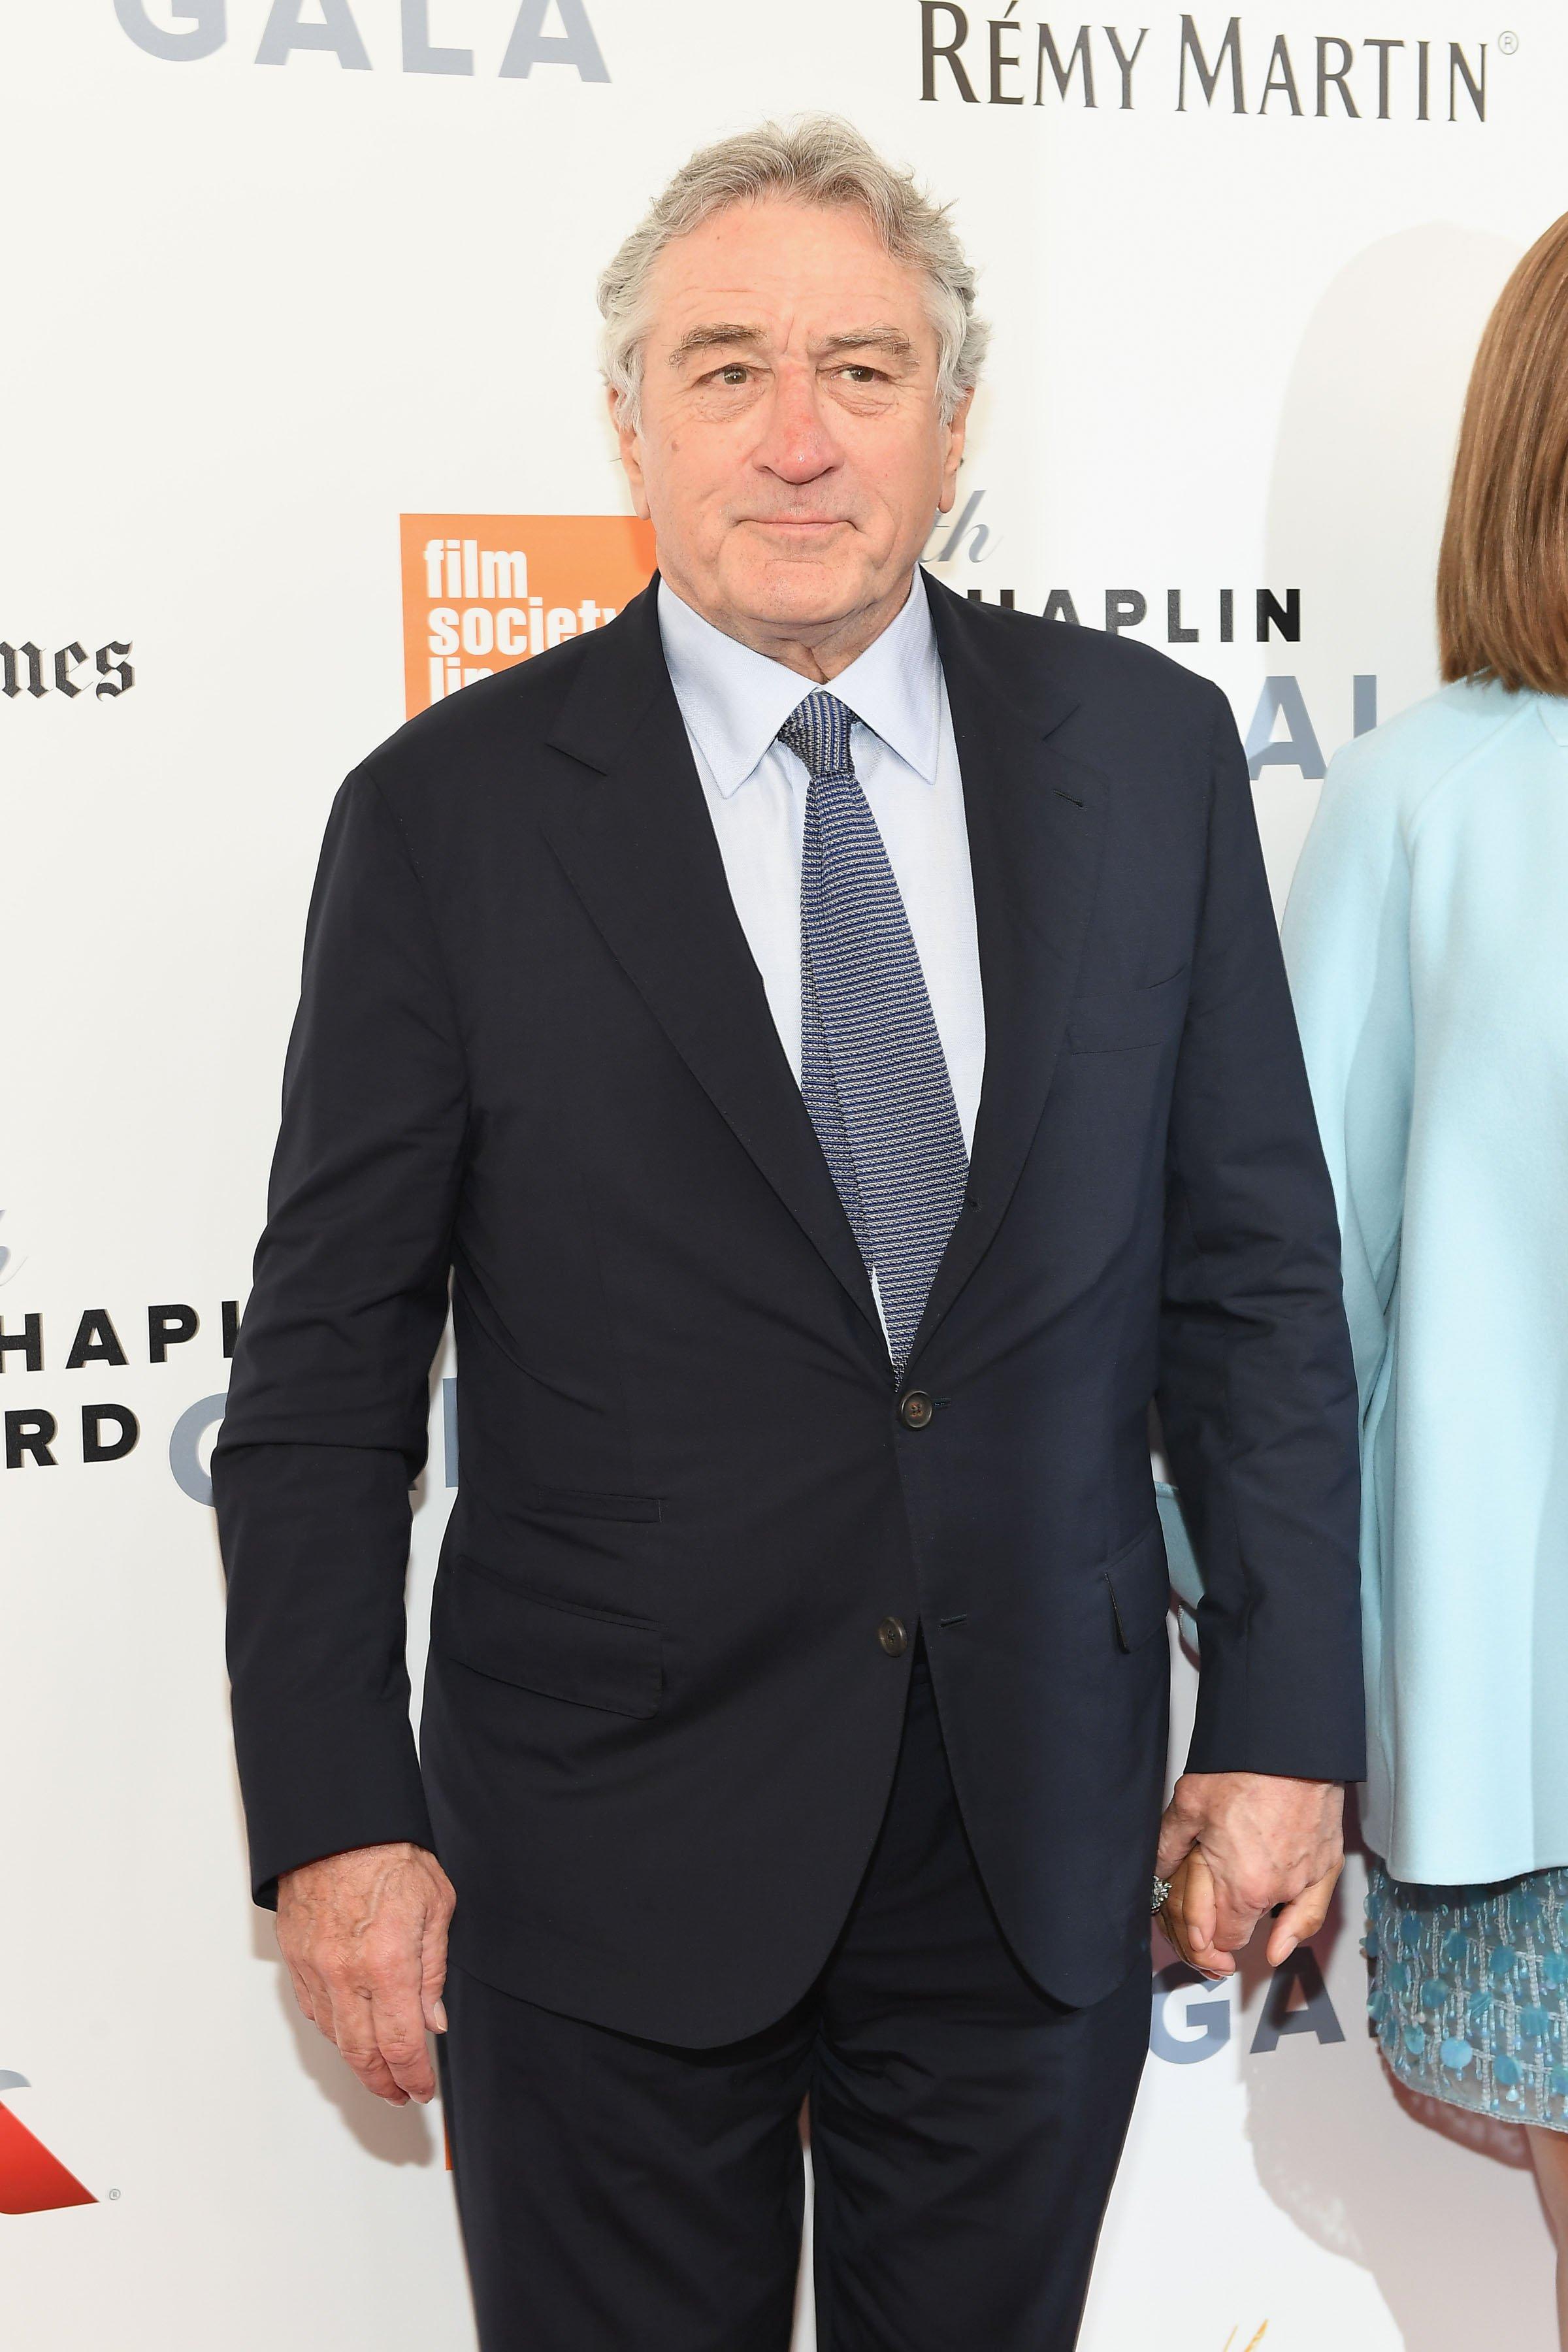 Robert De Niro attends the 44th Chaplin Award Gala at David H. Koch Theater at Lincoln Center on May 8, 2017 in New York City